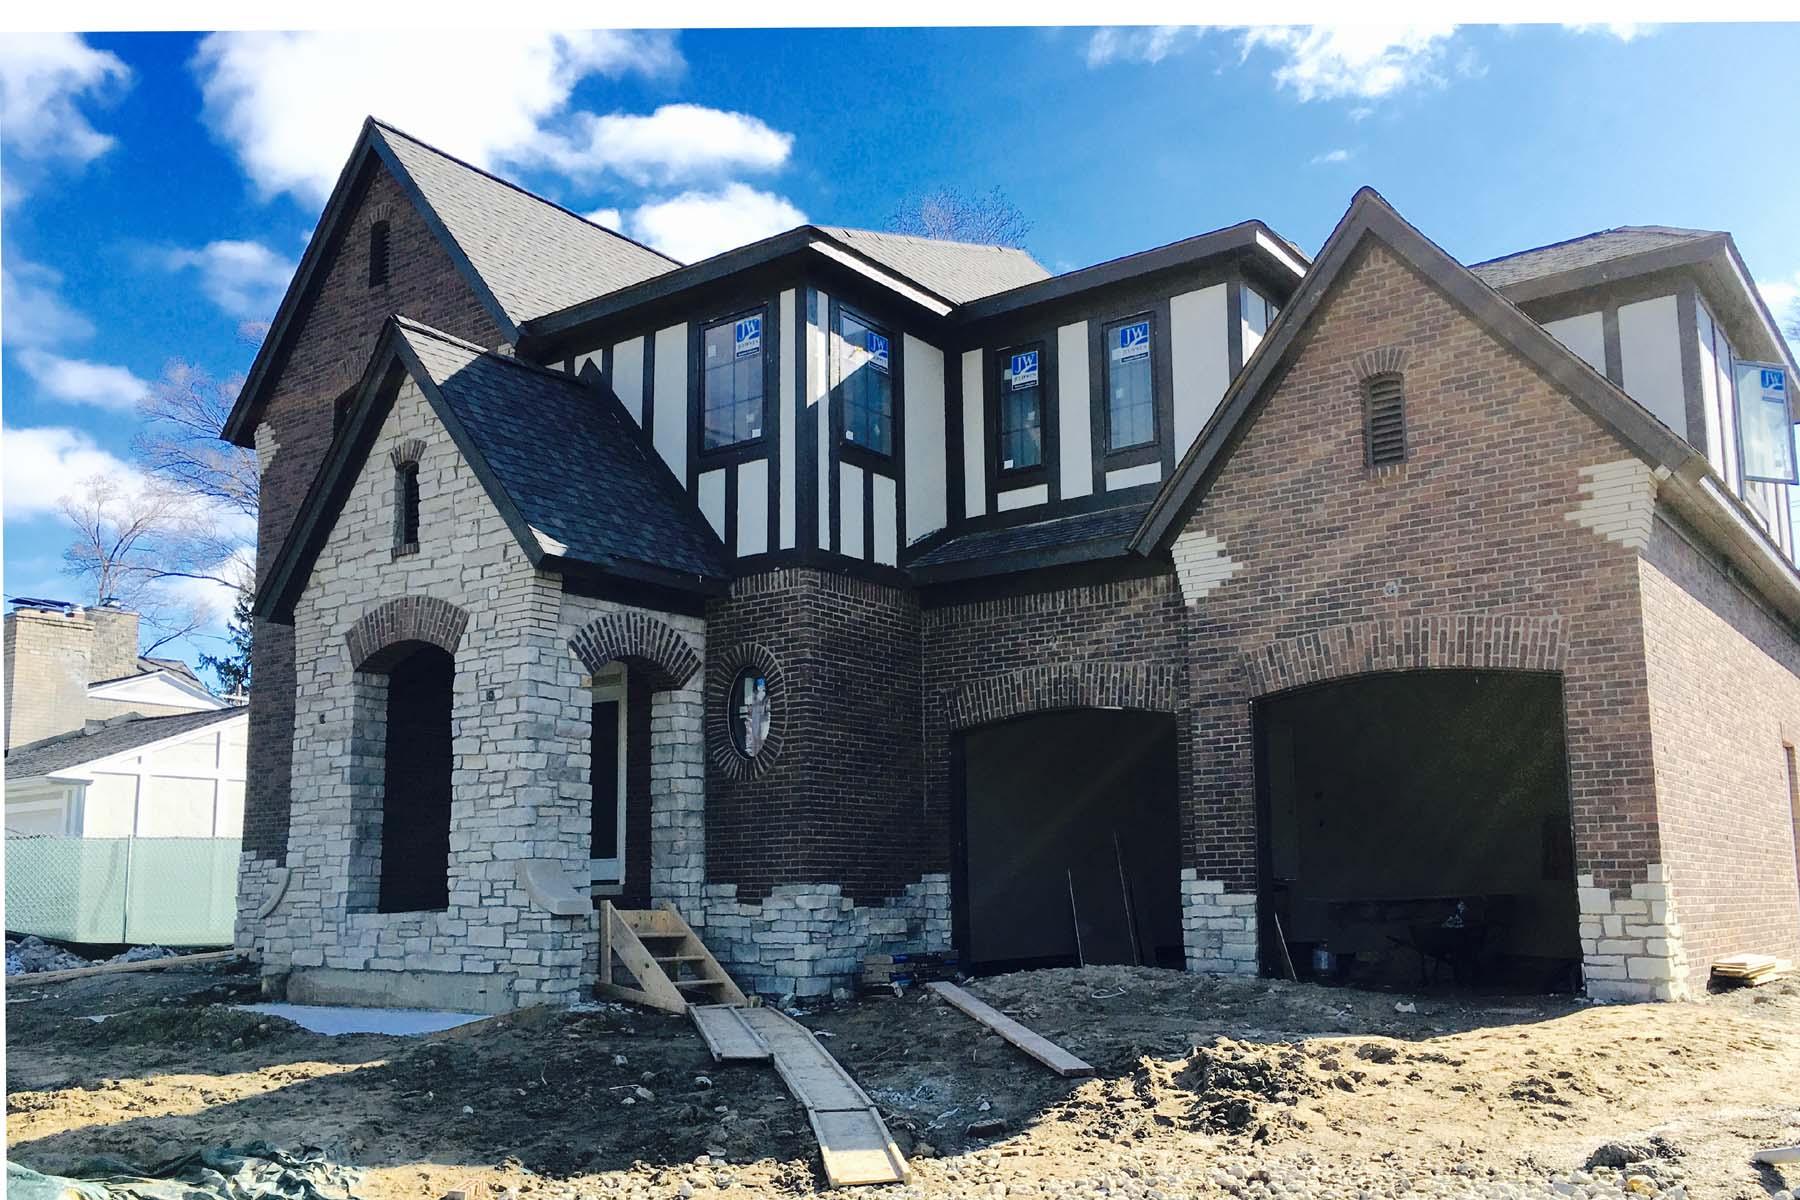 Single Family Home for Sale at Birmingham 1575 Shipman Birmingham, Michigan, 48009 United States